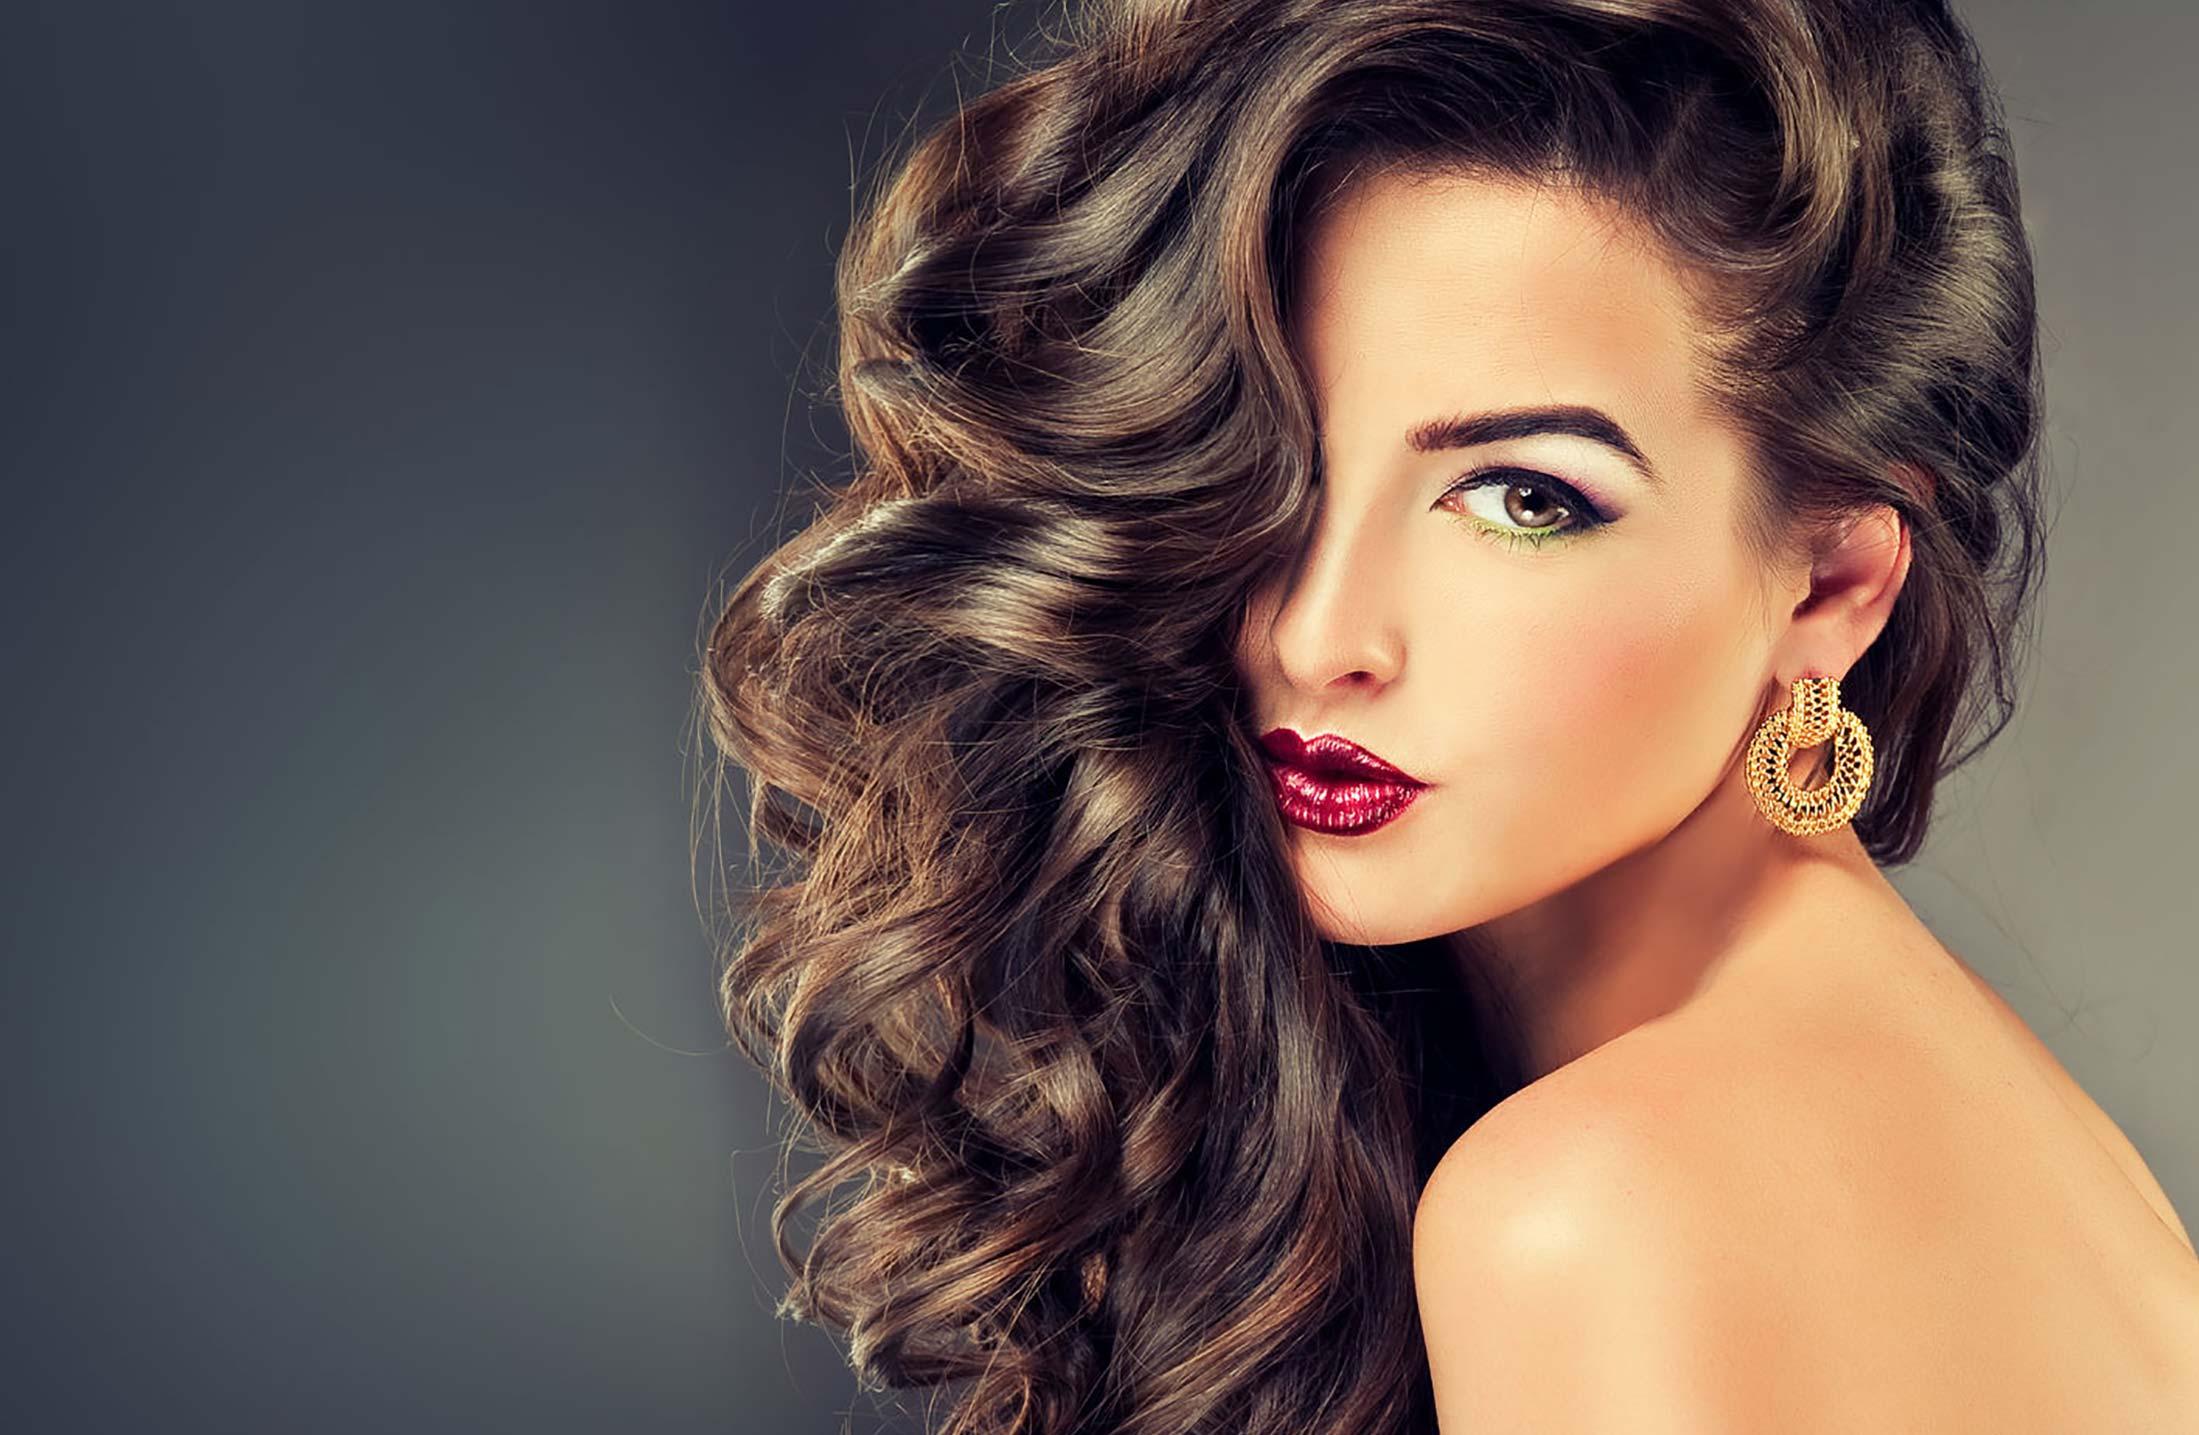 Beauty And Fashion Cunardo: صور بنات جميله جدا , صور جميله للفتيات